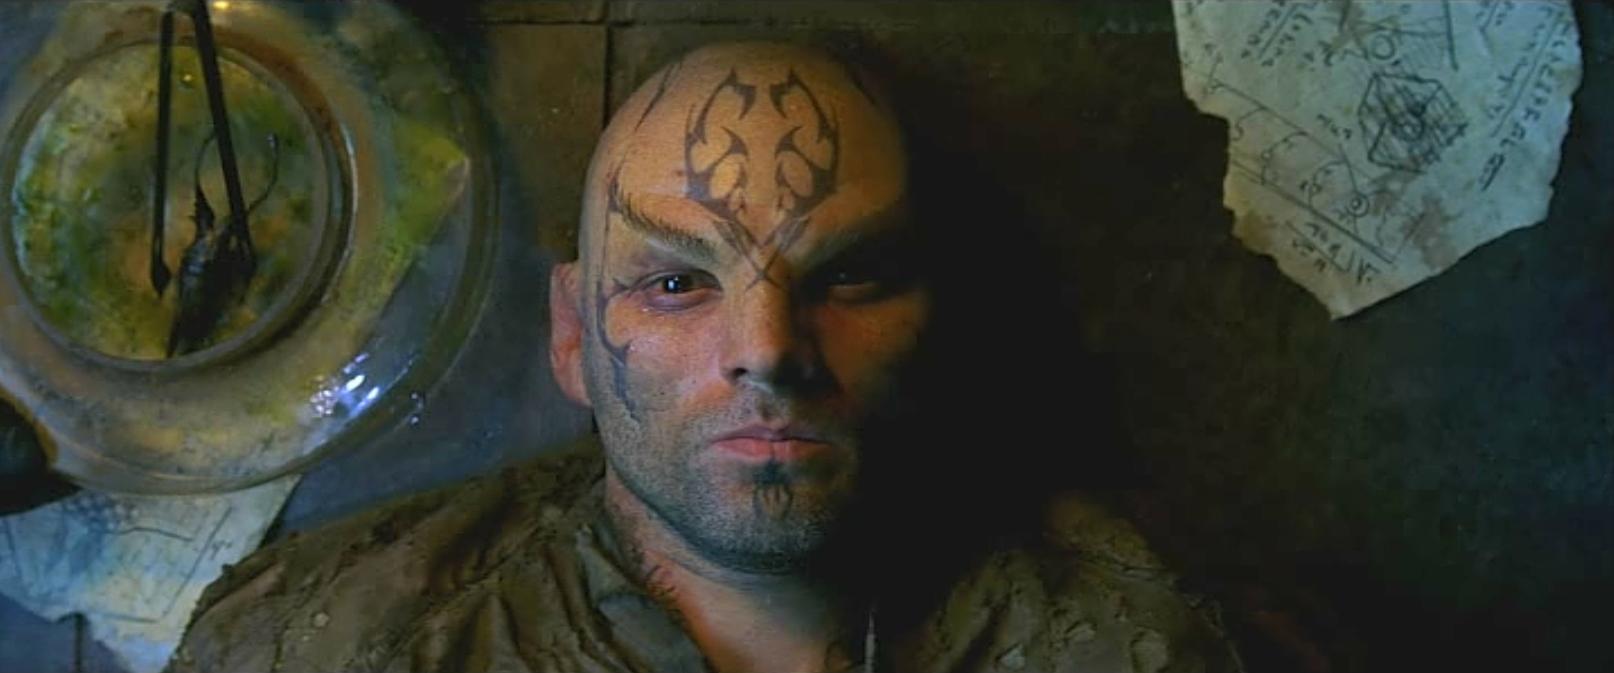 BR #096 - Thor: Le Monde des Ténèbres Star-Trek-Deleted-Scene-Nero-prison